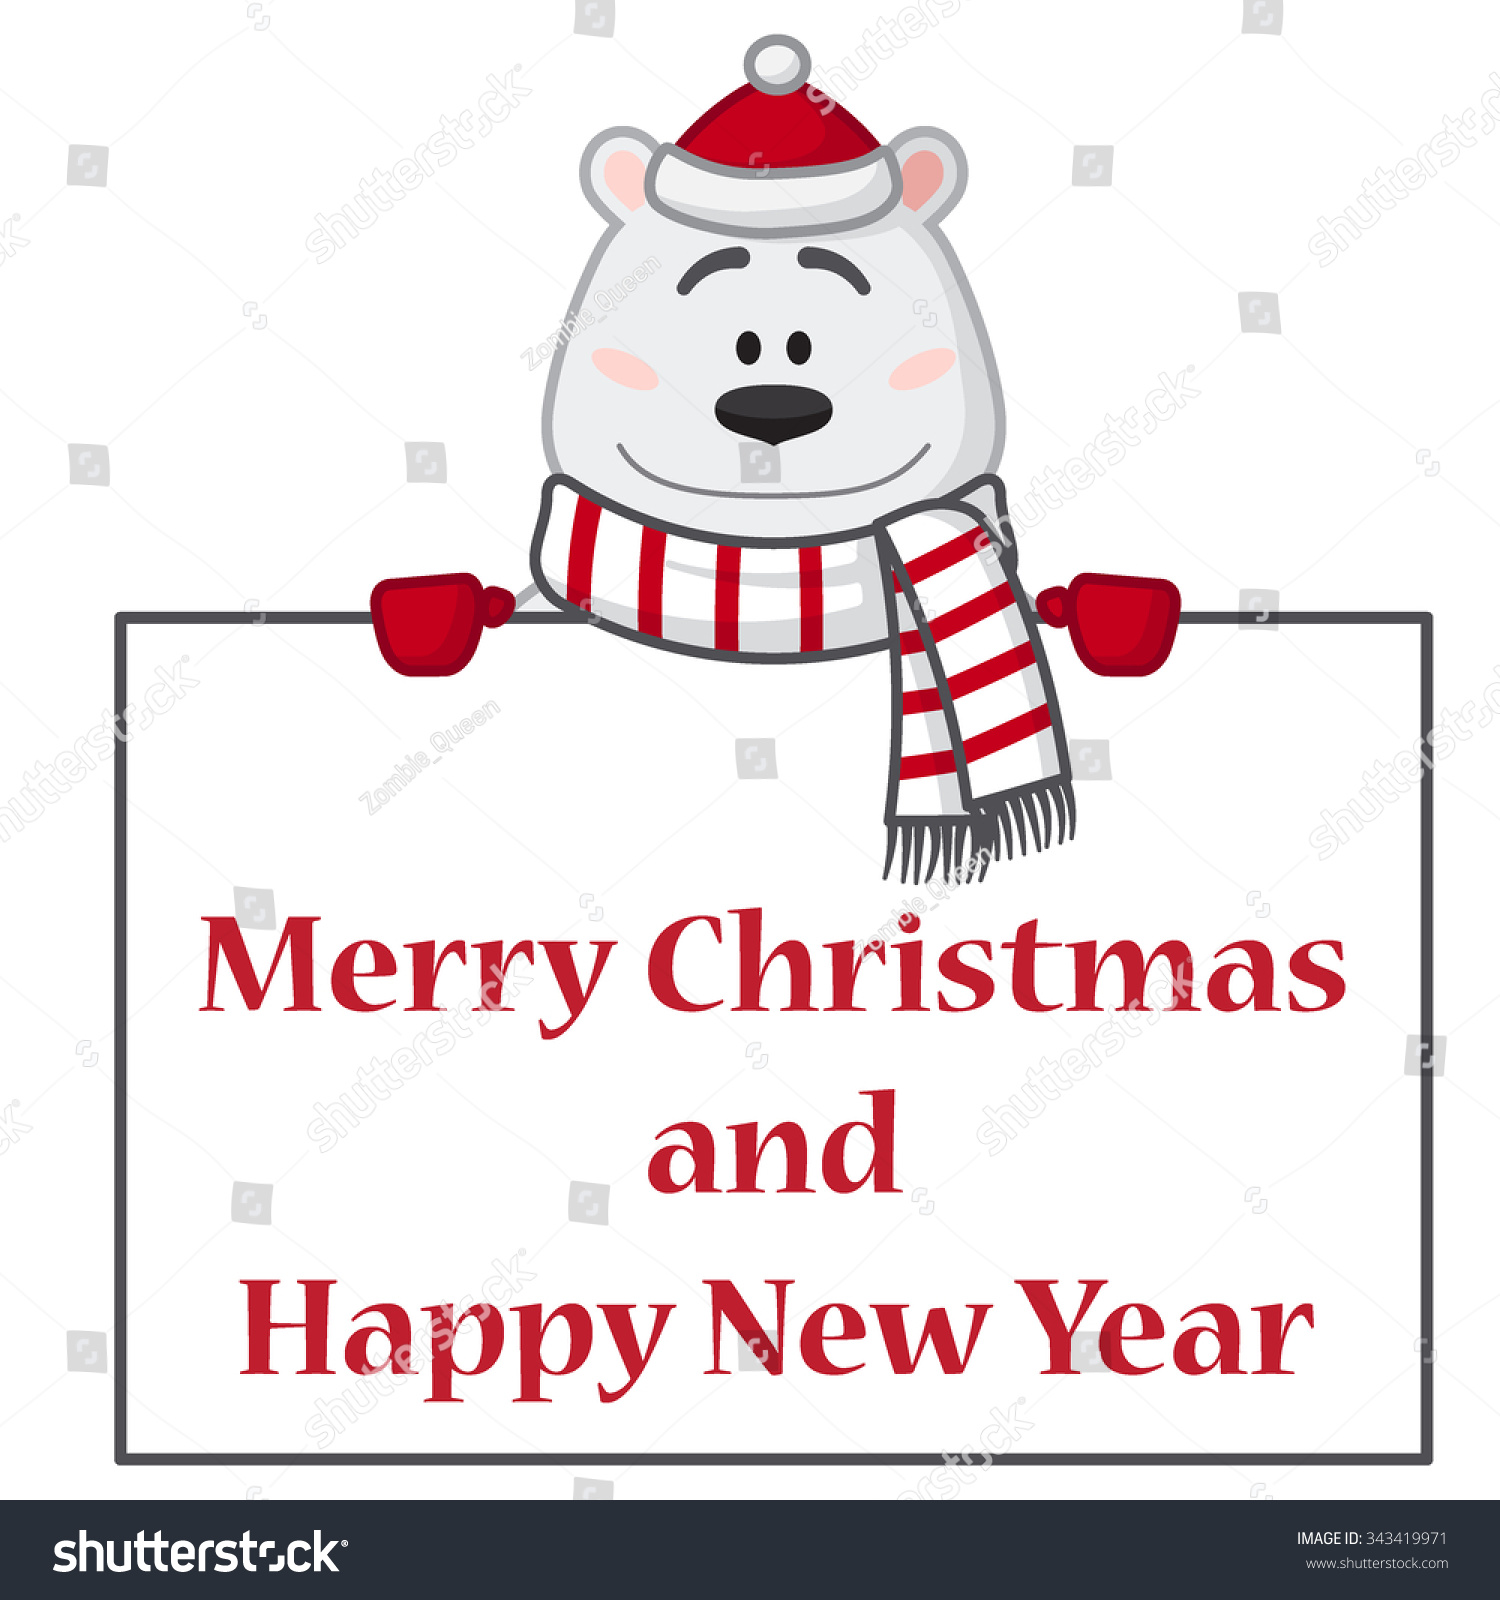 Christmas Card Decorative Element Cute Bear Stock Vector (Royalty ...